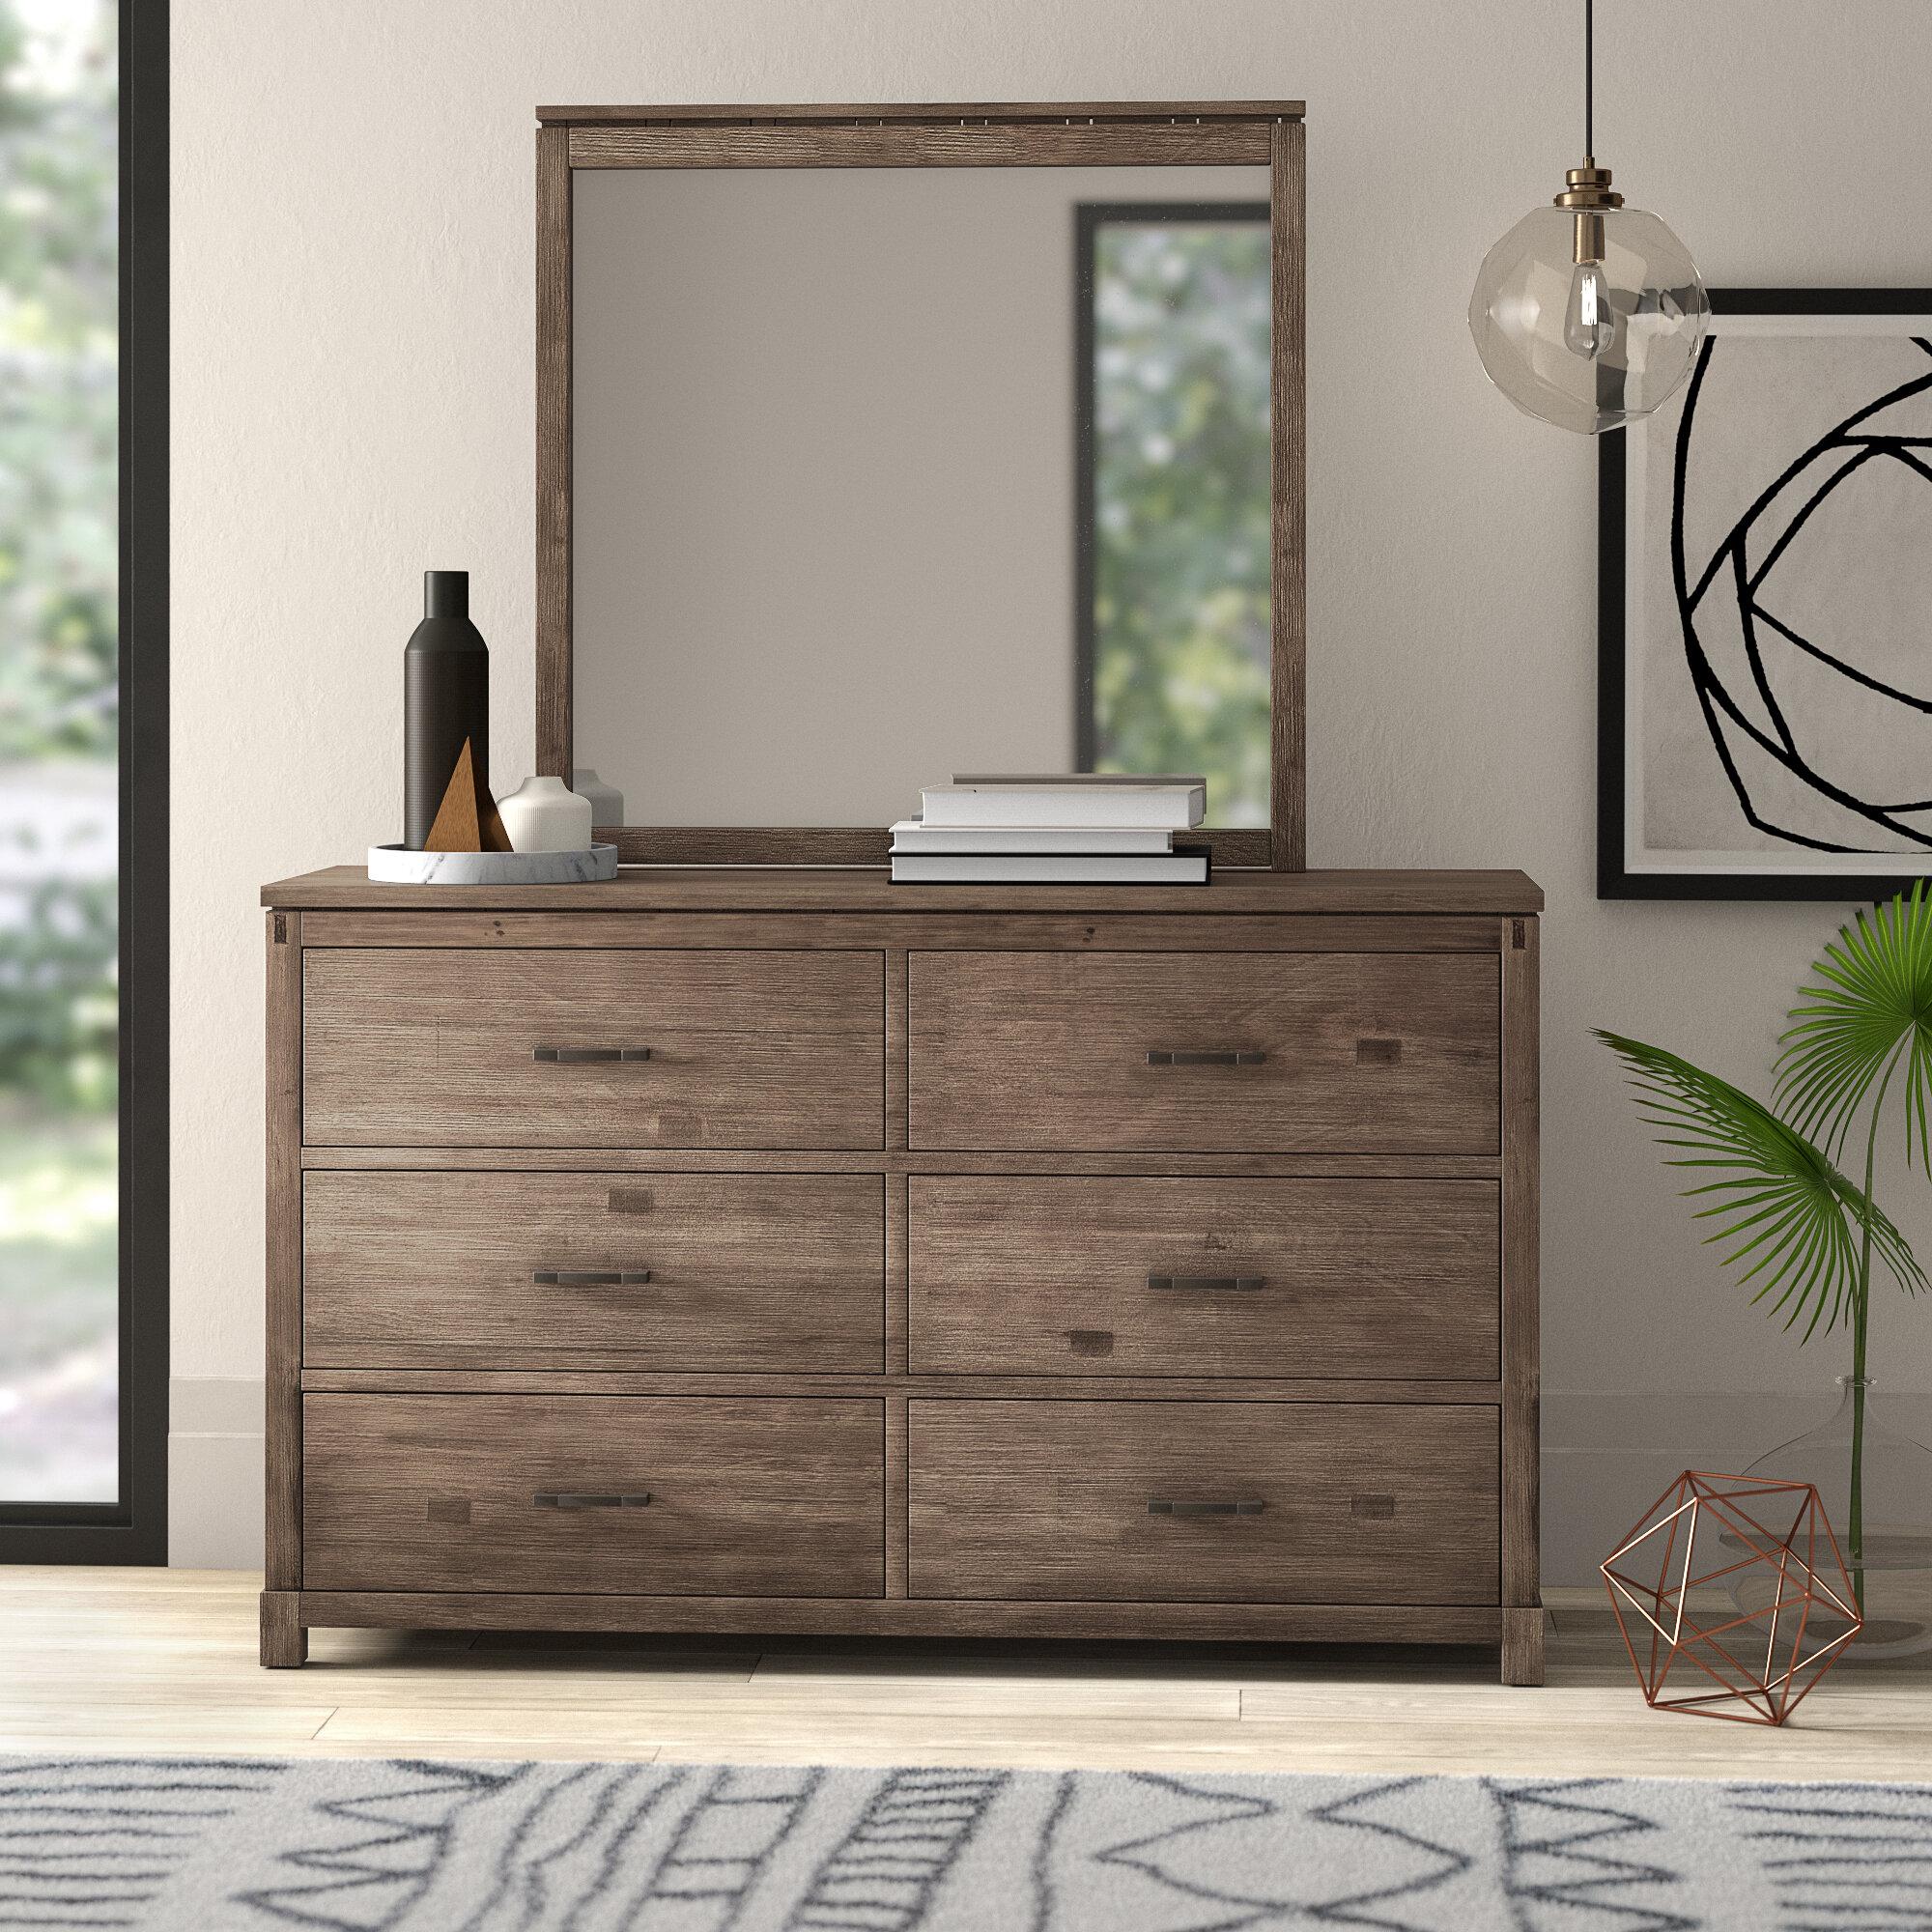 Seleukos 6 Drawer Double Dresser